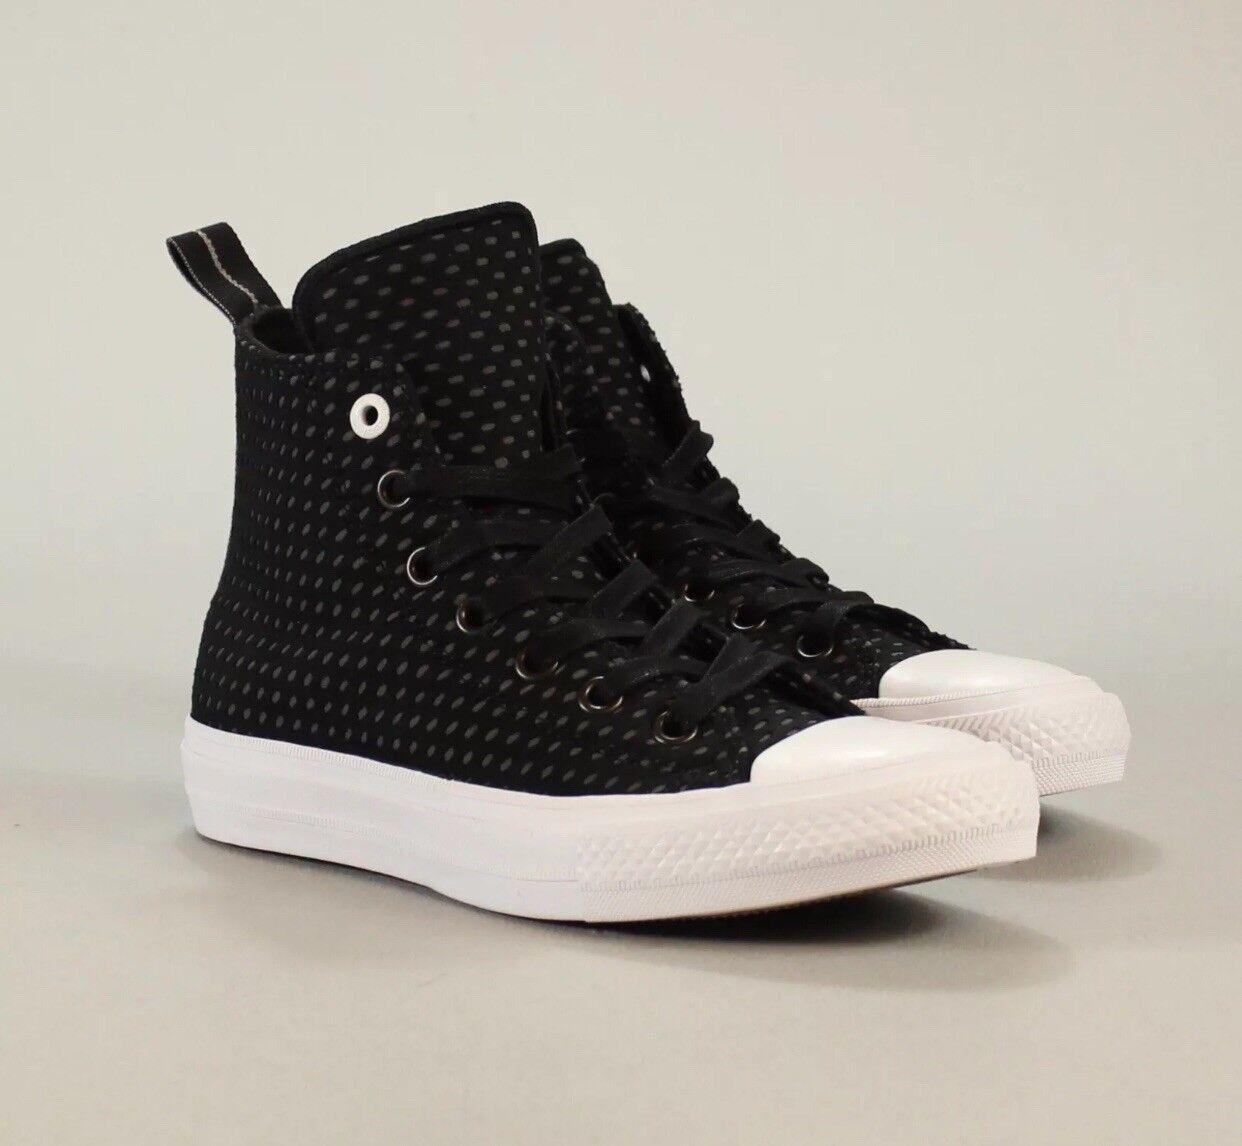 Converse Converse Converse negro trueno blancoo Talla UK 7 b31a58